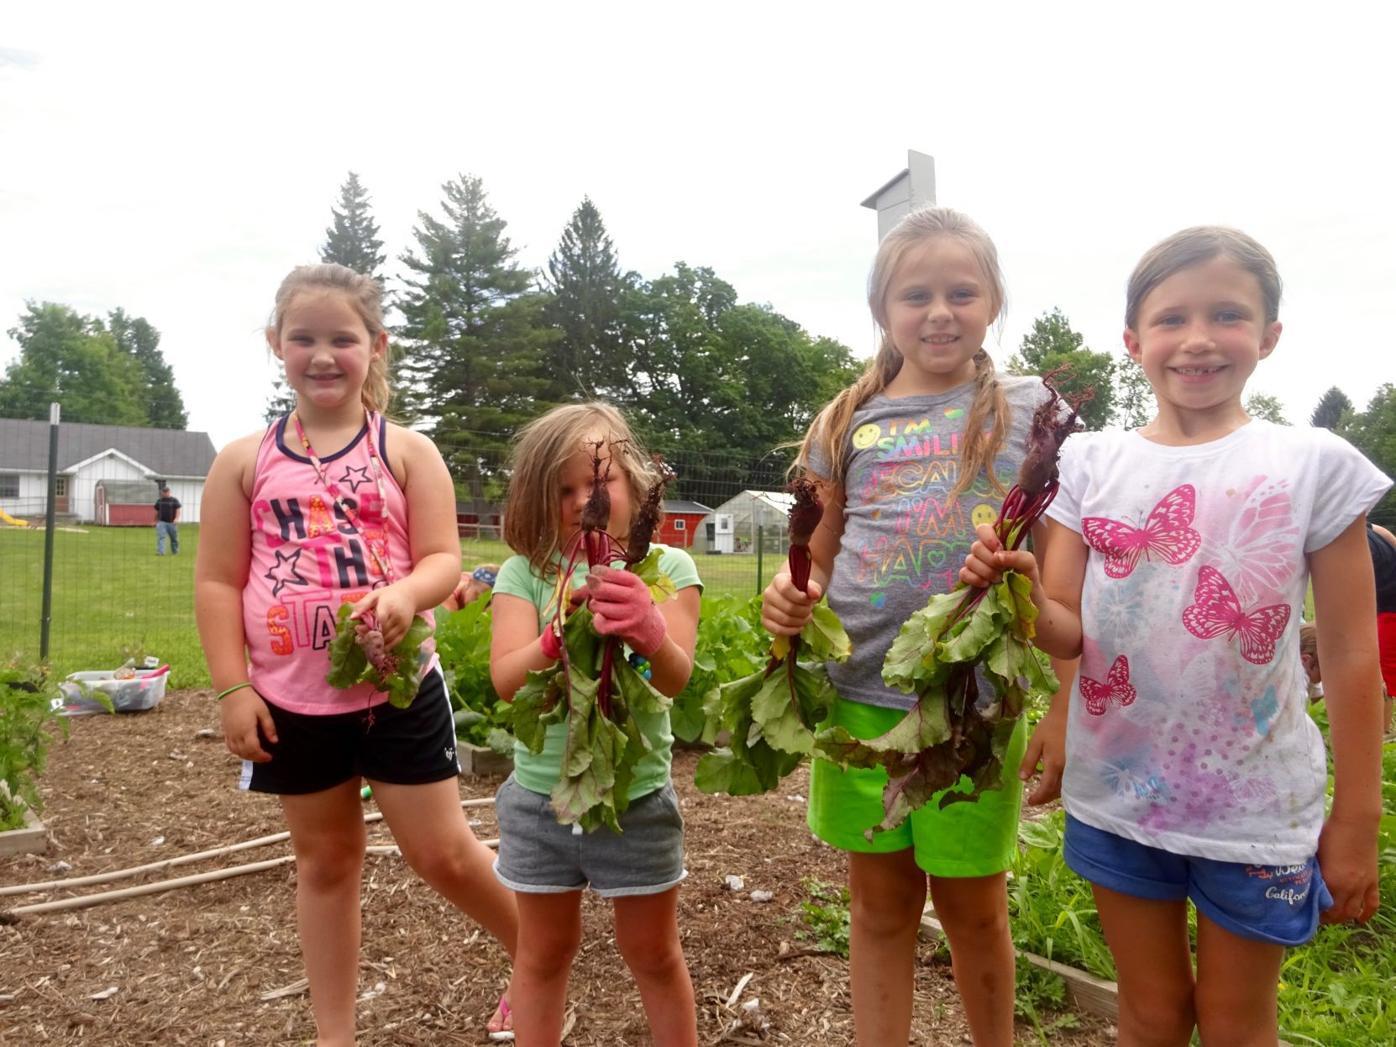 Sunshine Farm teaches many lessons at Crellin Elementary